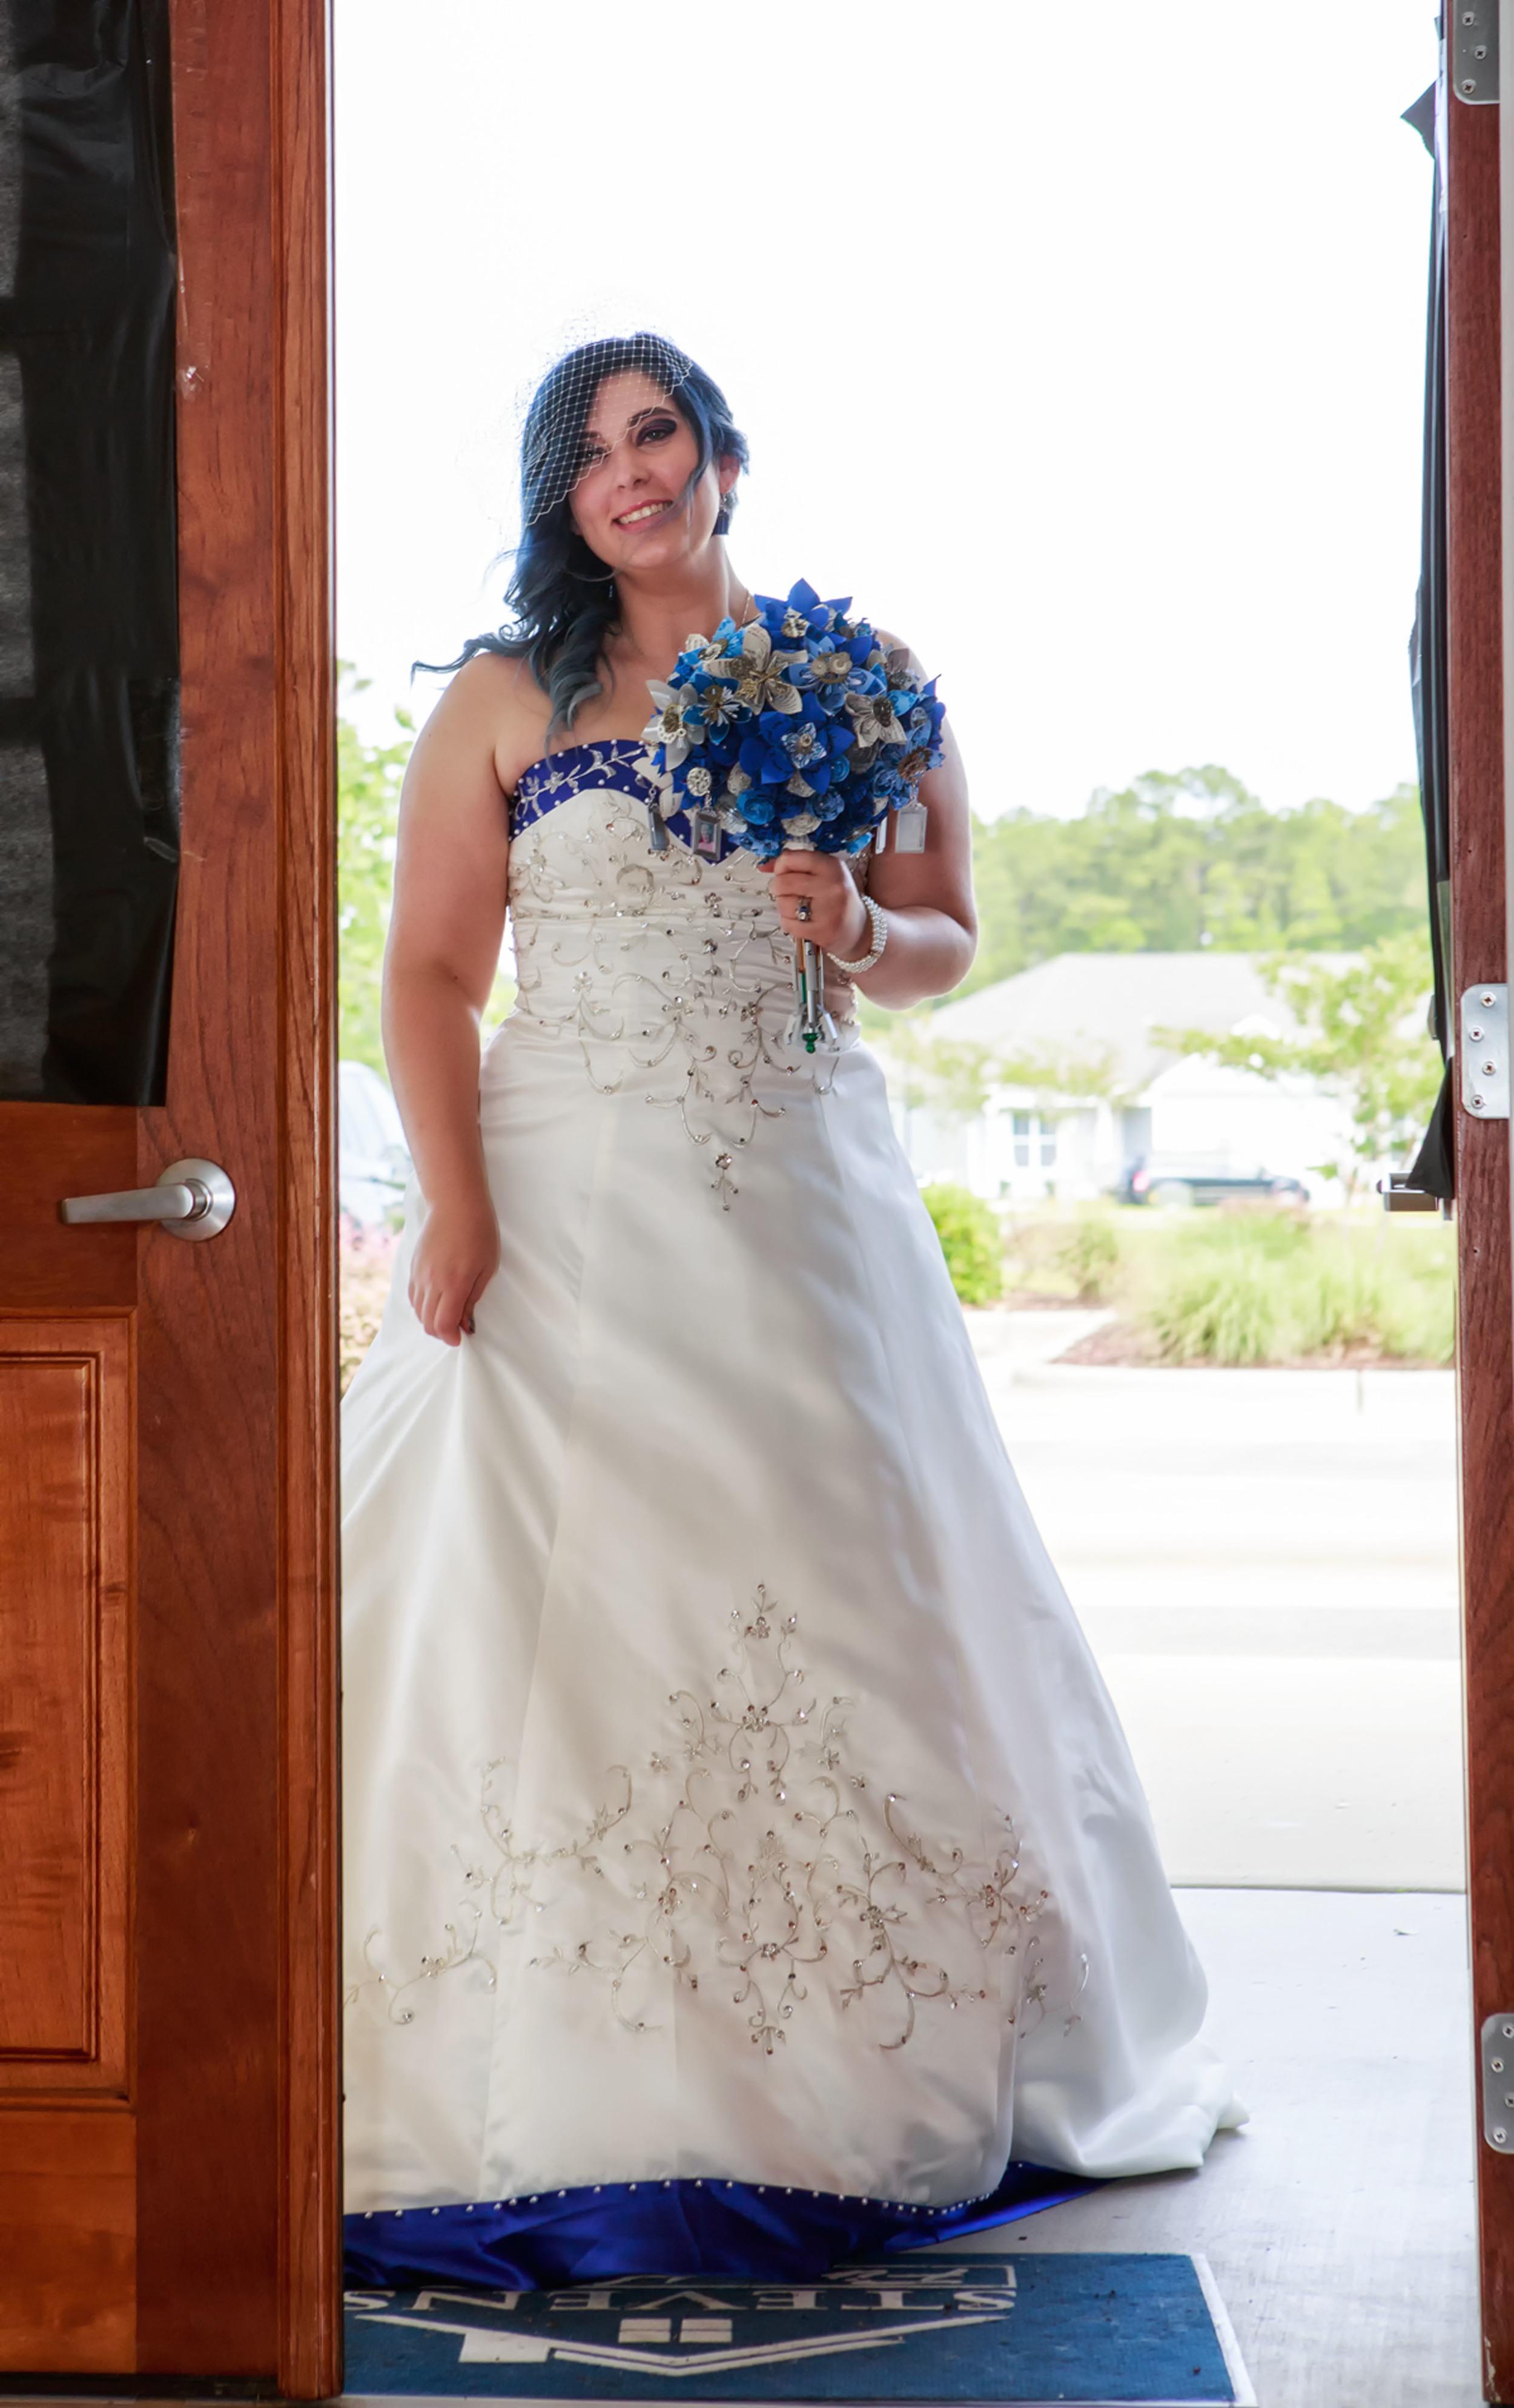 NC_Wedding_Photographer_Tiffany_Abruzzo_Ceremony_13.jpg